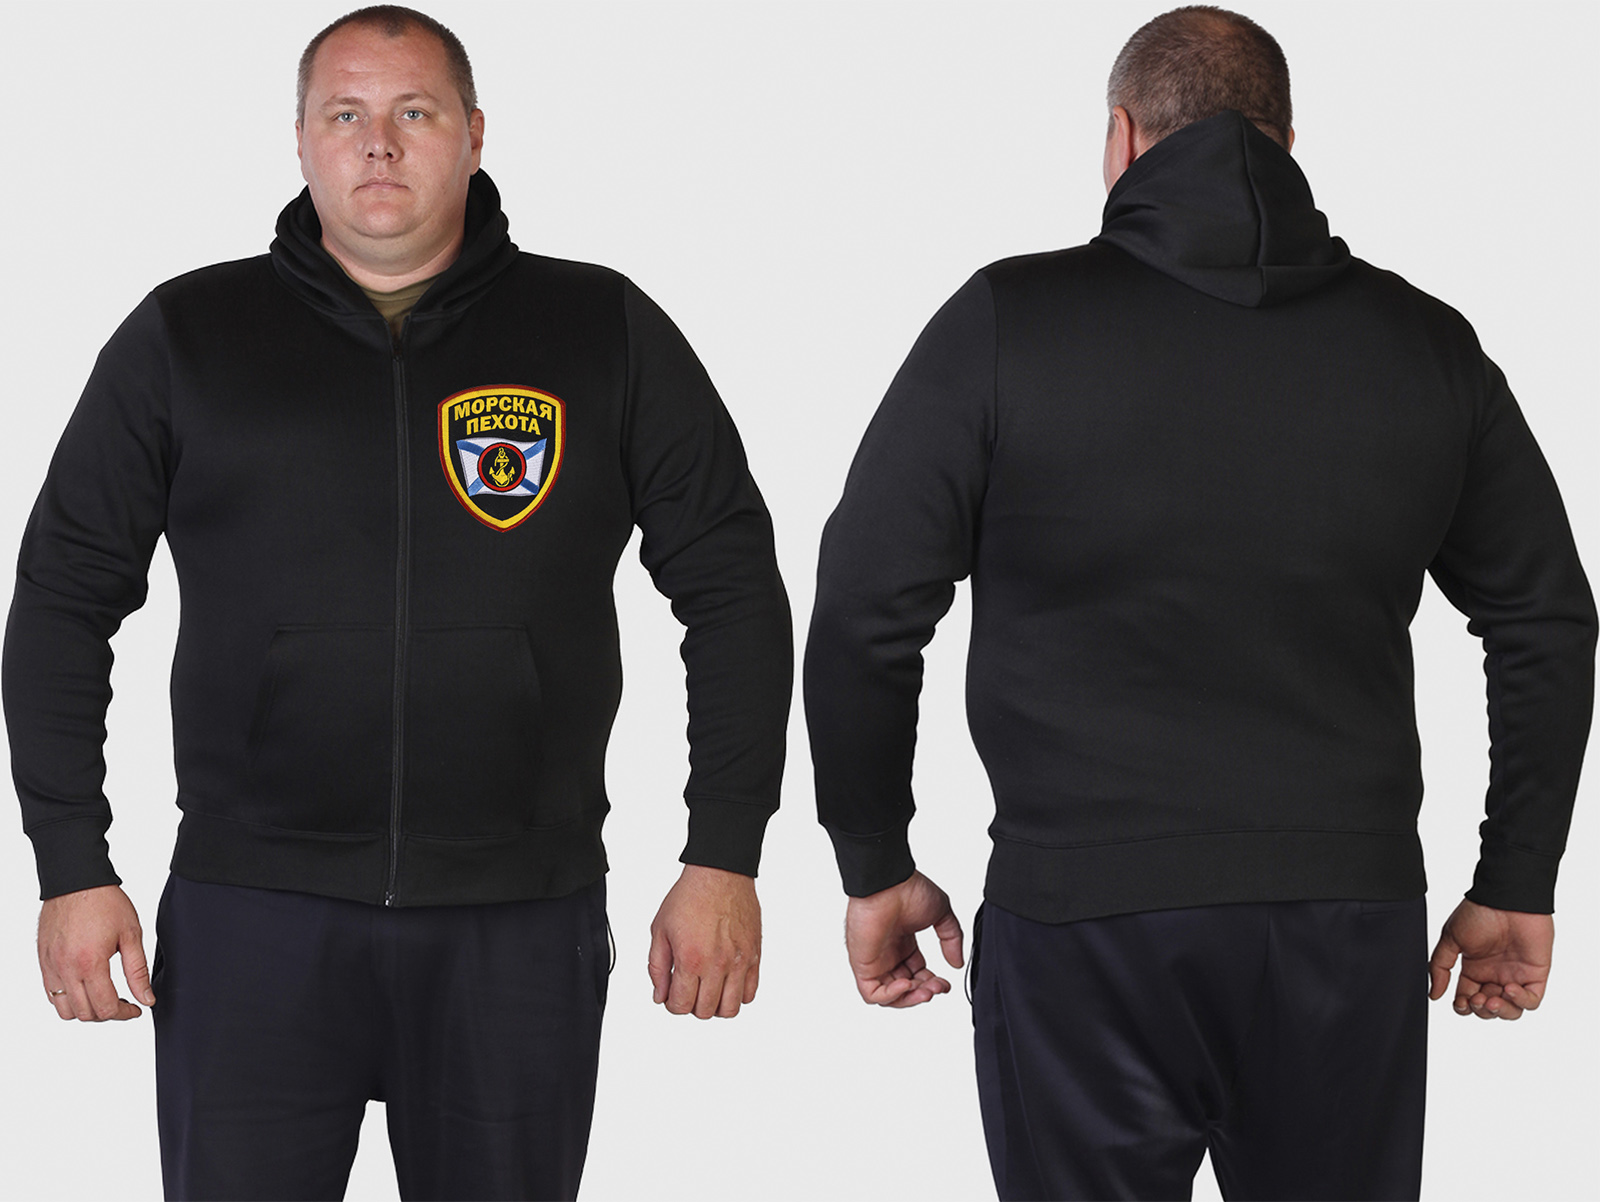 Эффектная мужская толстовка Морская Пехота!